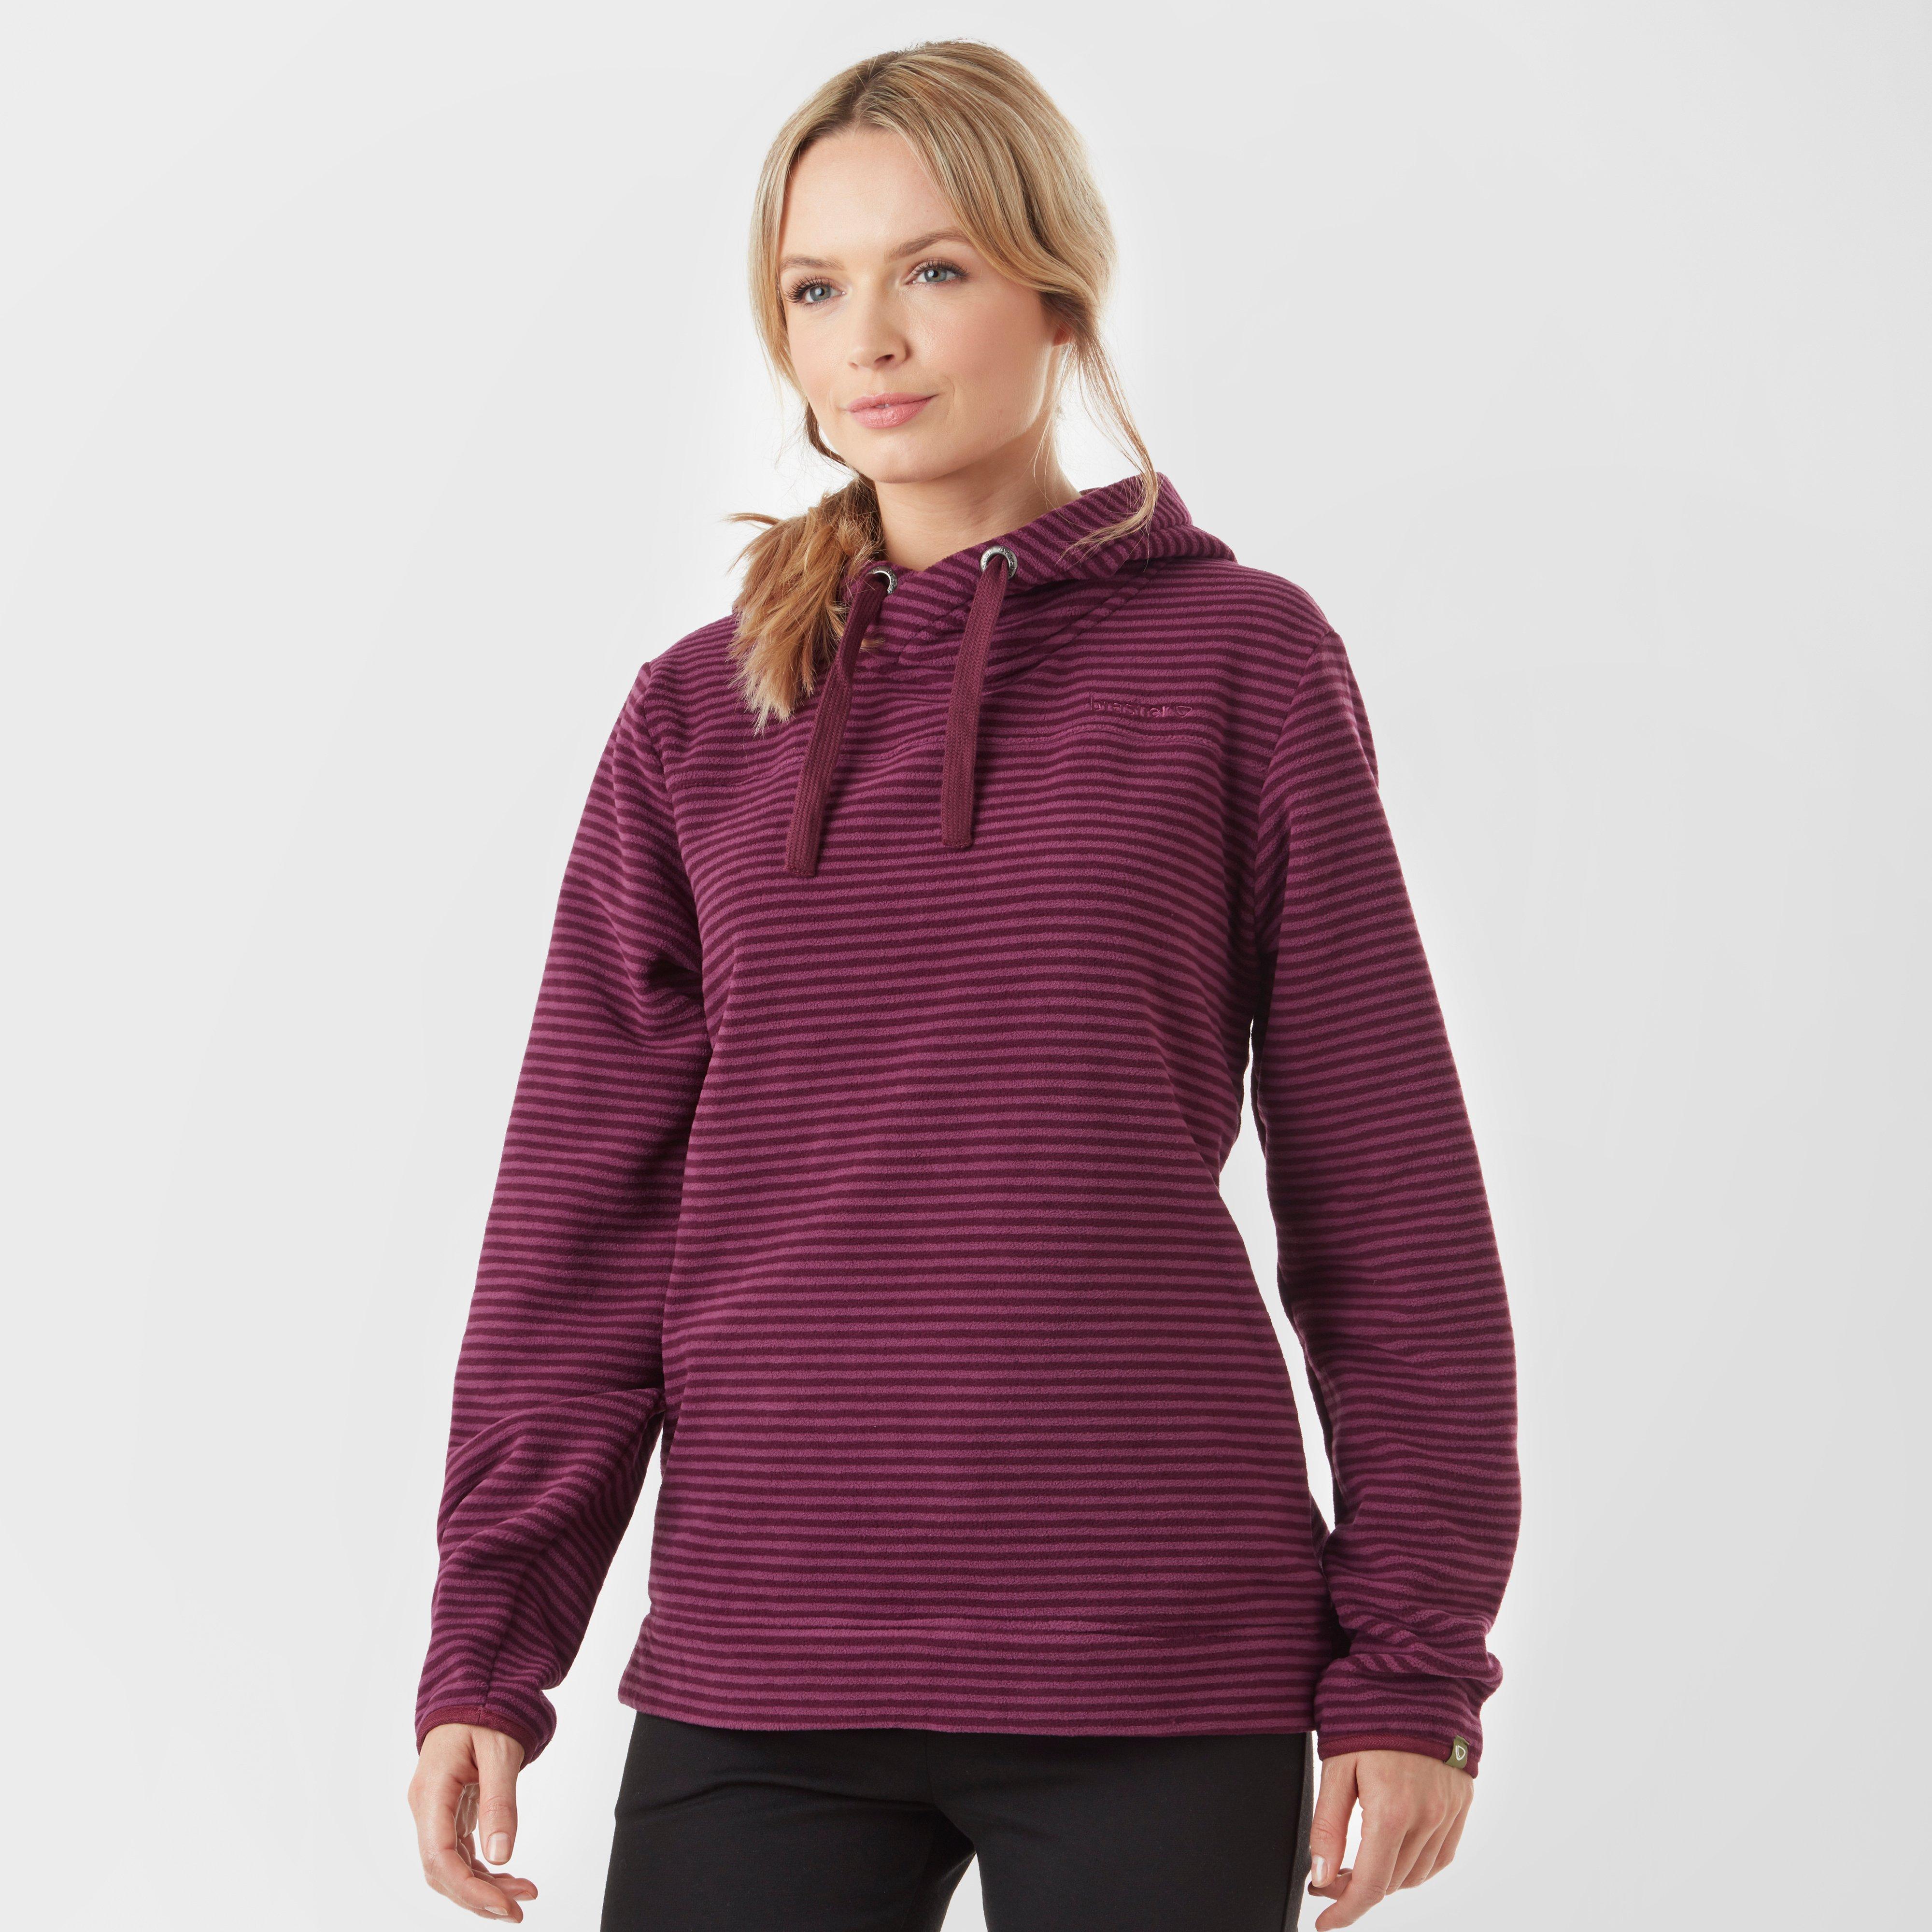 Brasher Womens Wildemoor Hooded Fleece - Pink/mpk  Pink/mpk